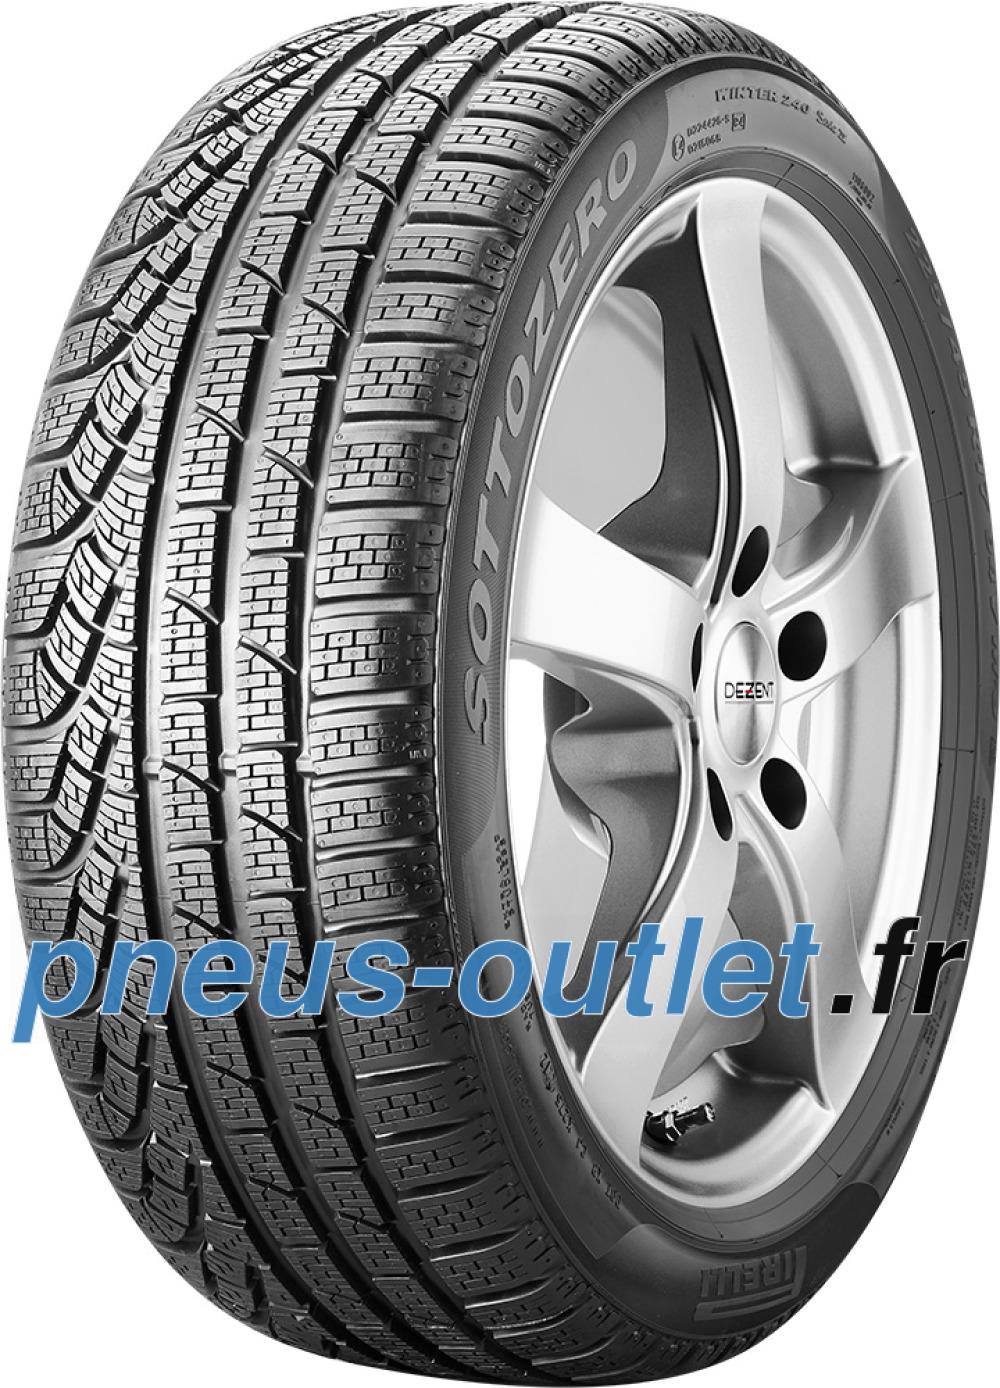 Pirelli W 240 SottoZero S2 ( 235/40 R18 91V , N1, avec protège-jante (MFS) )